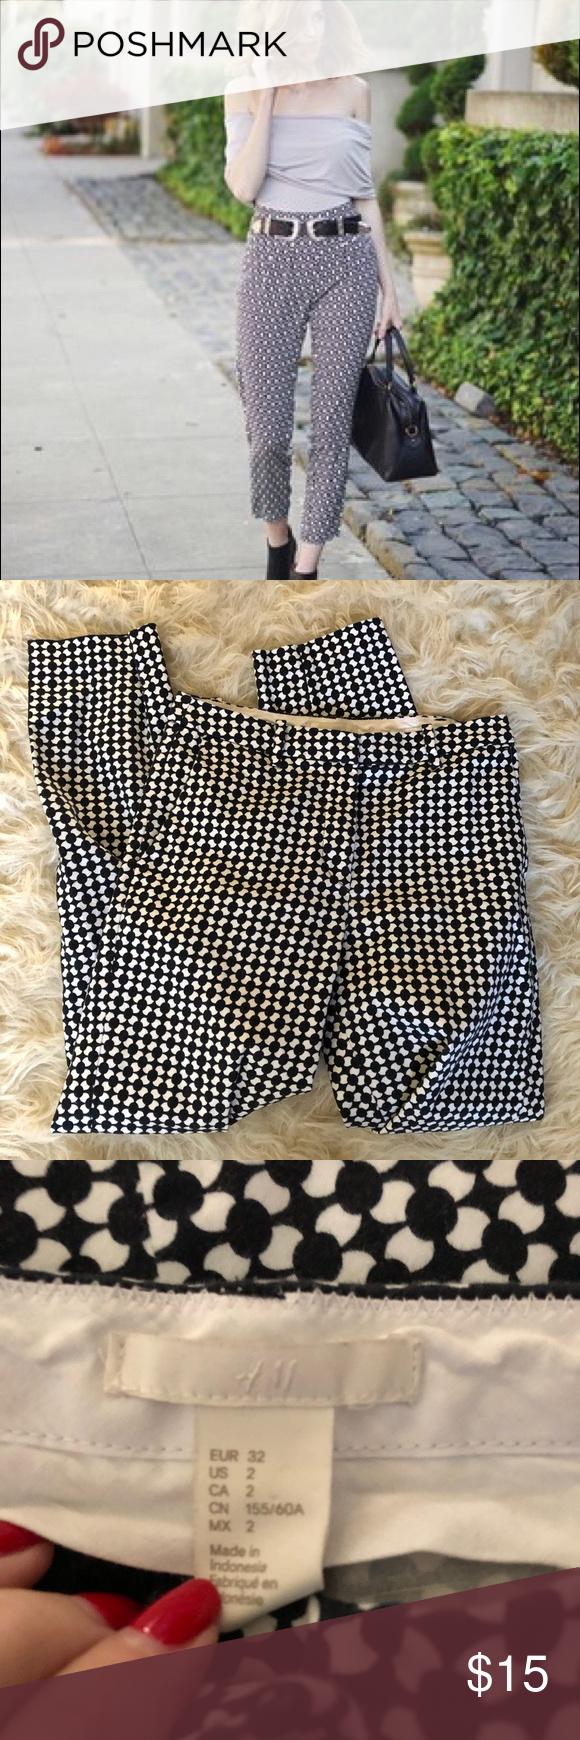 H M Black And White Geometric Print Pants Geometric Print Pants Clothes Design Geometric Print